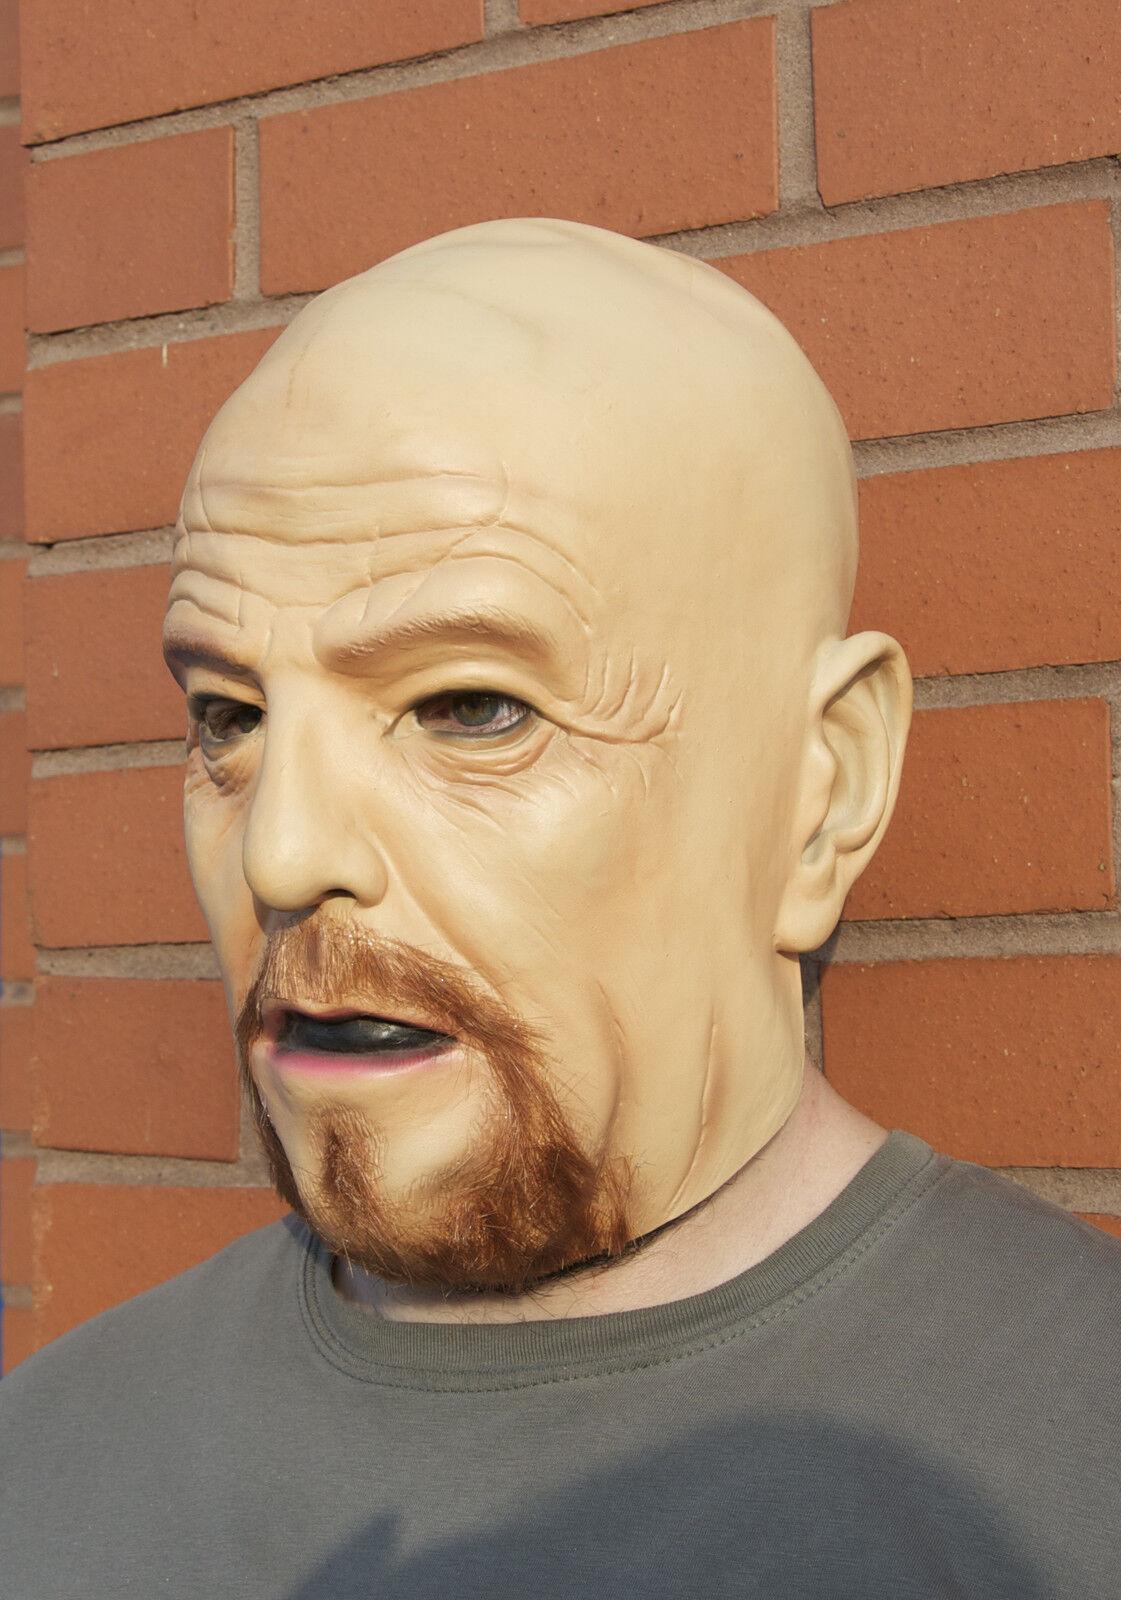 Walter white mask